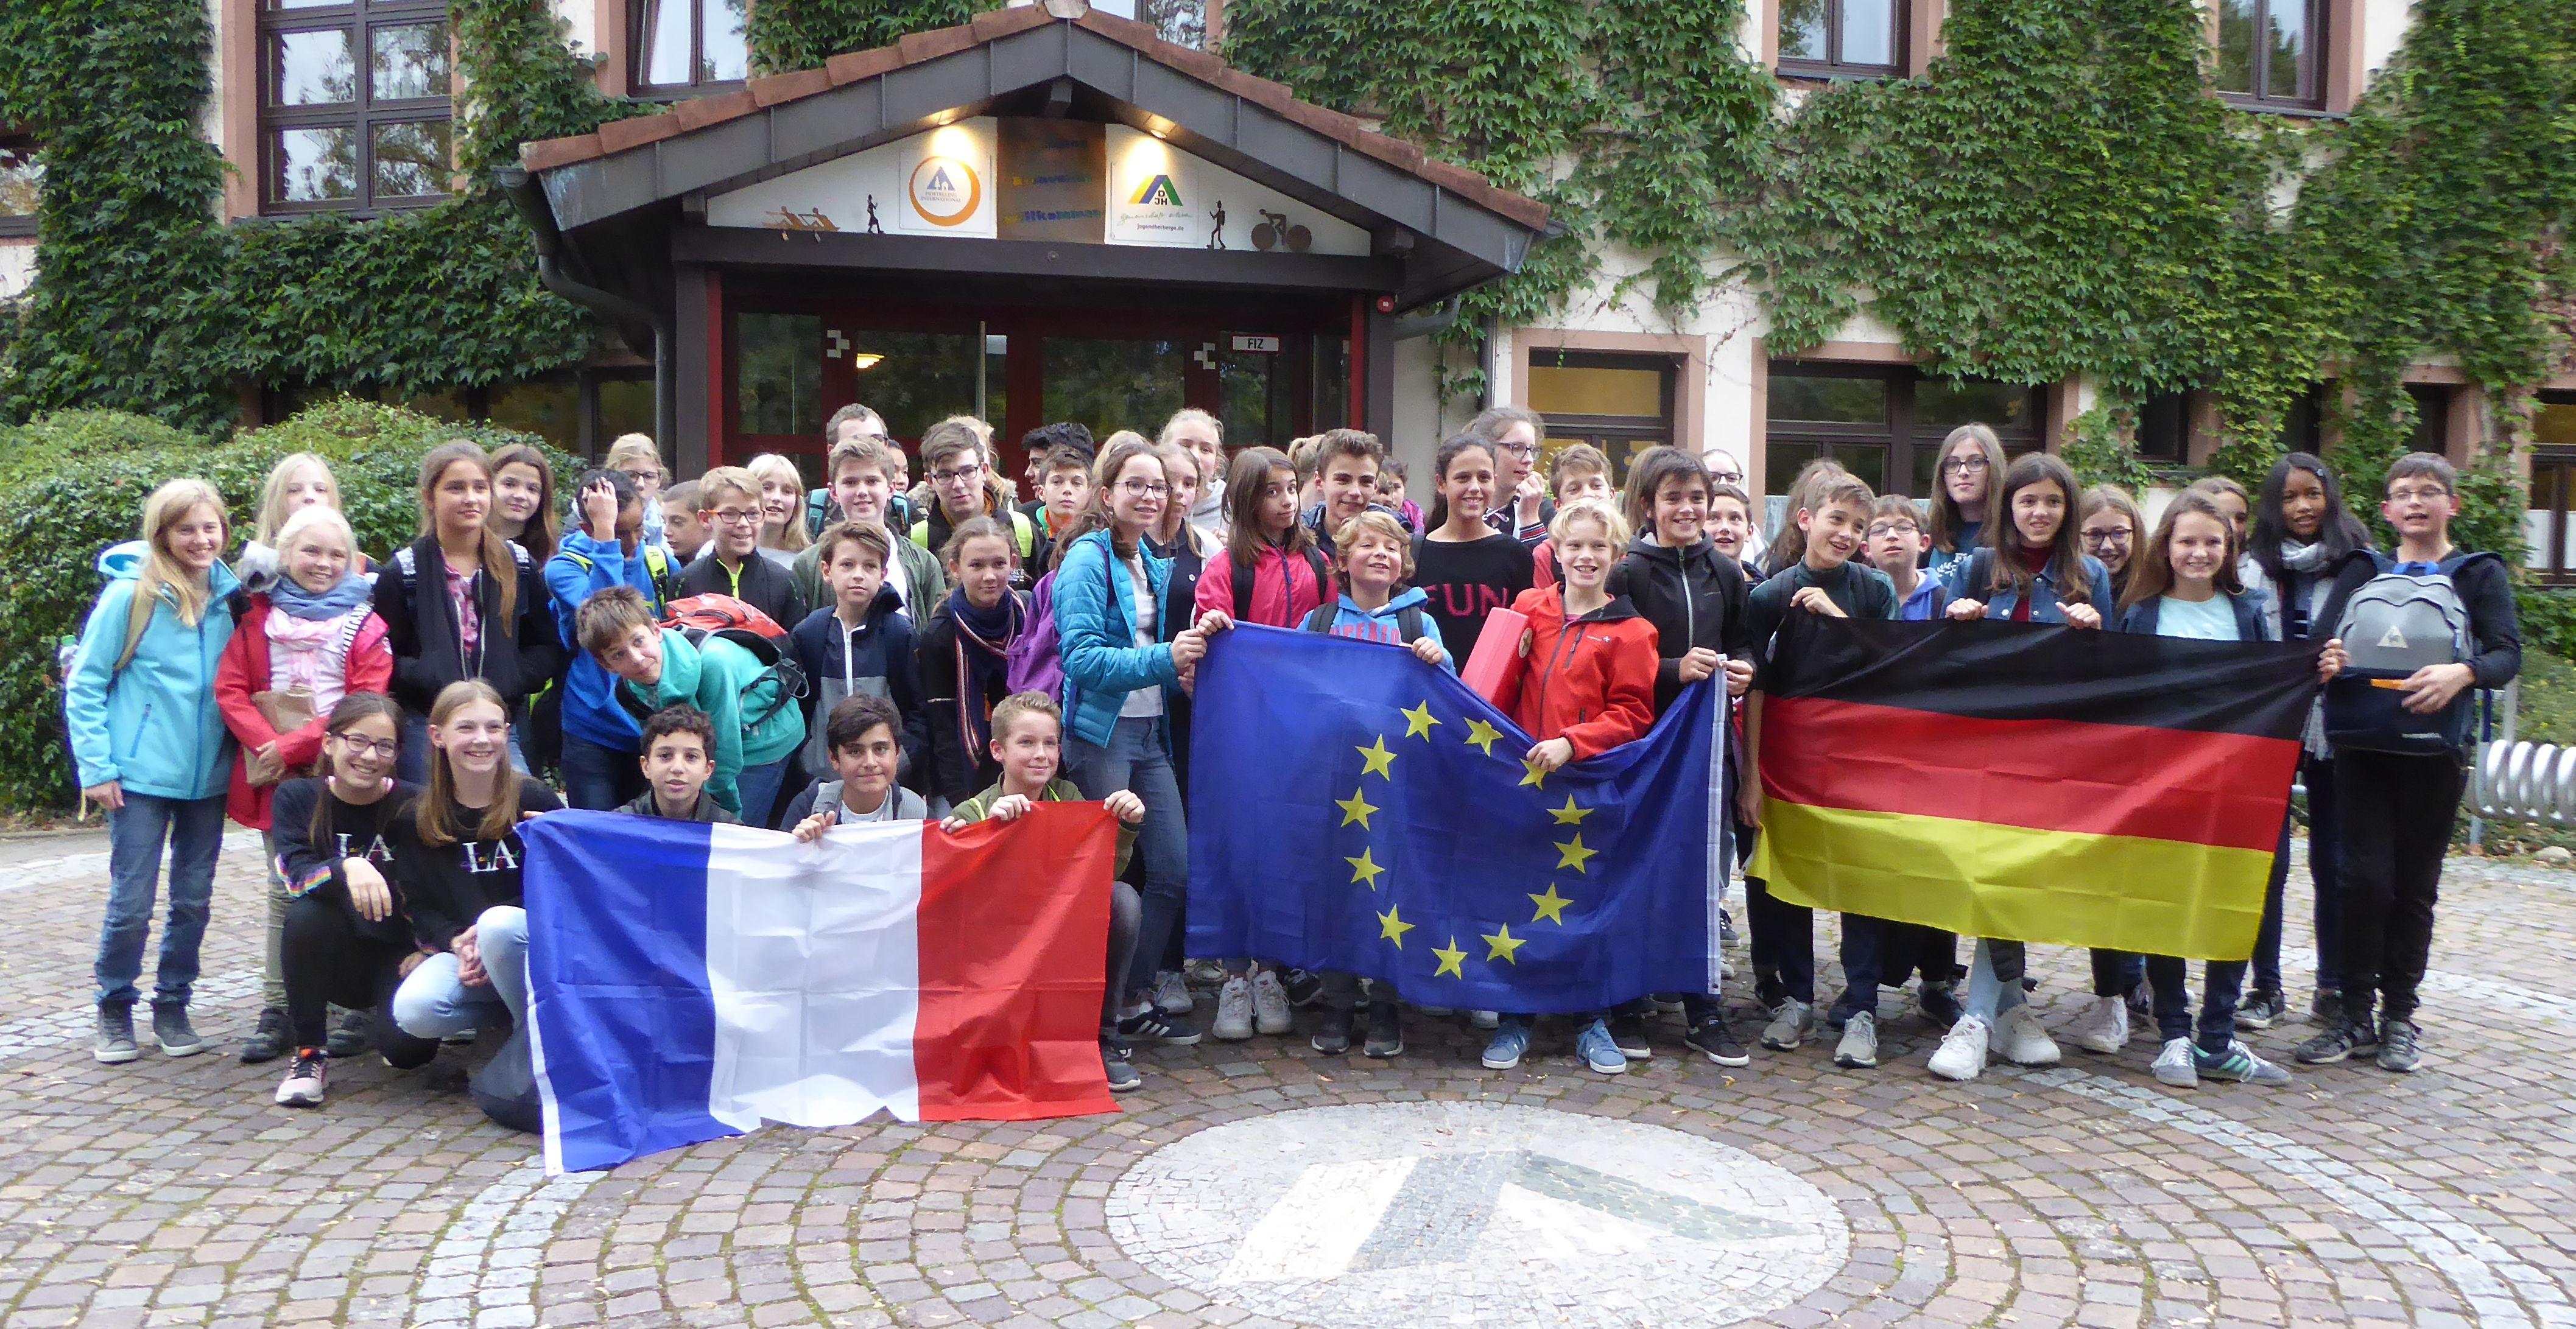 Hallo Deutschland – Bonjour la France!